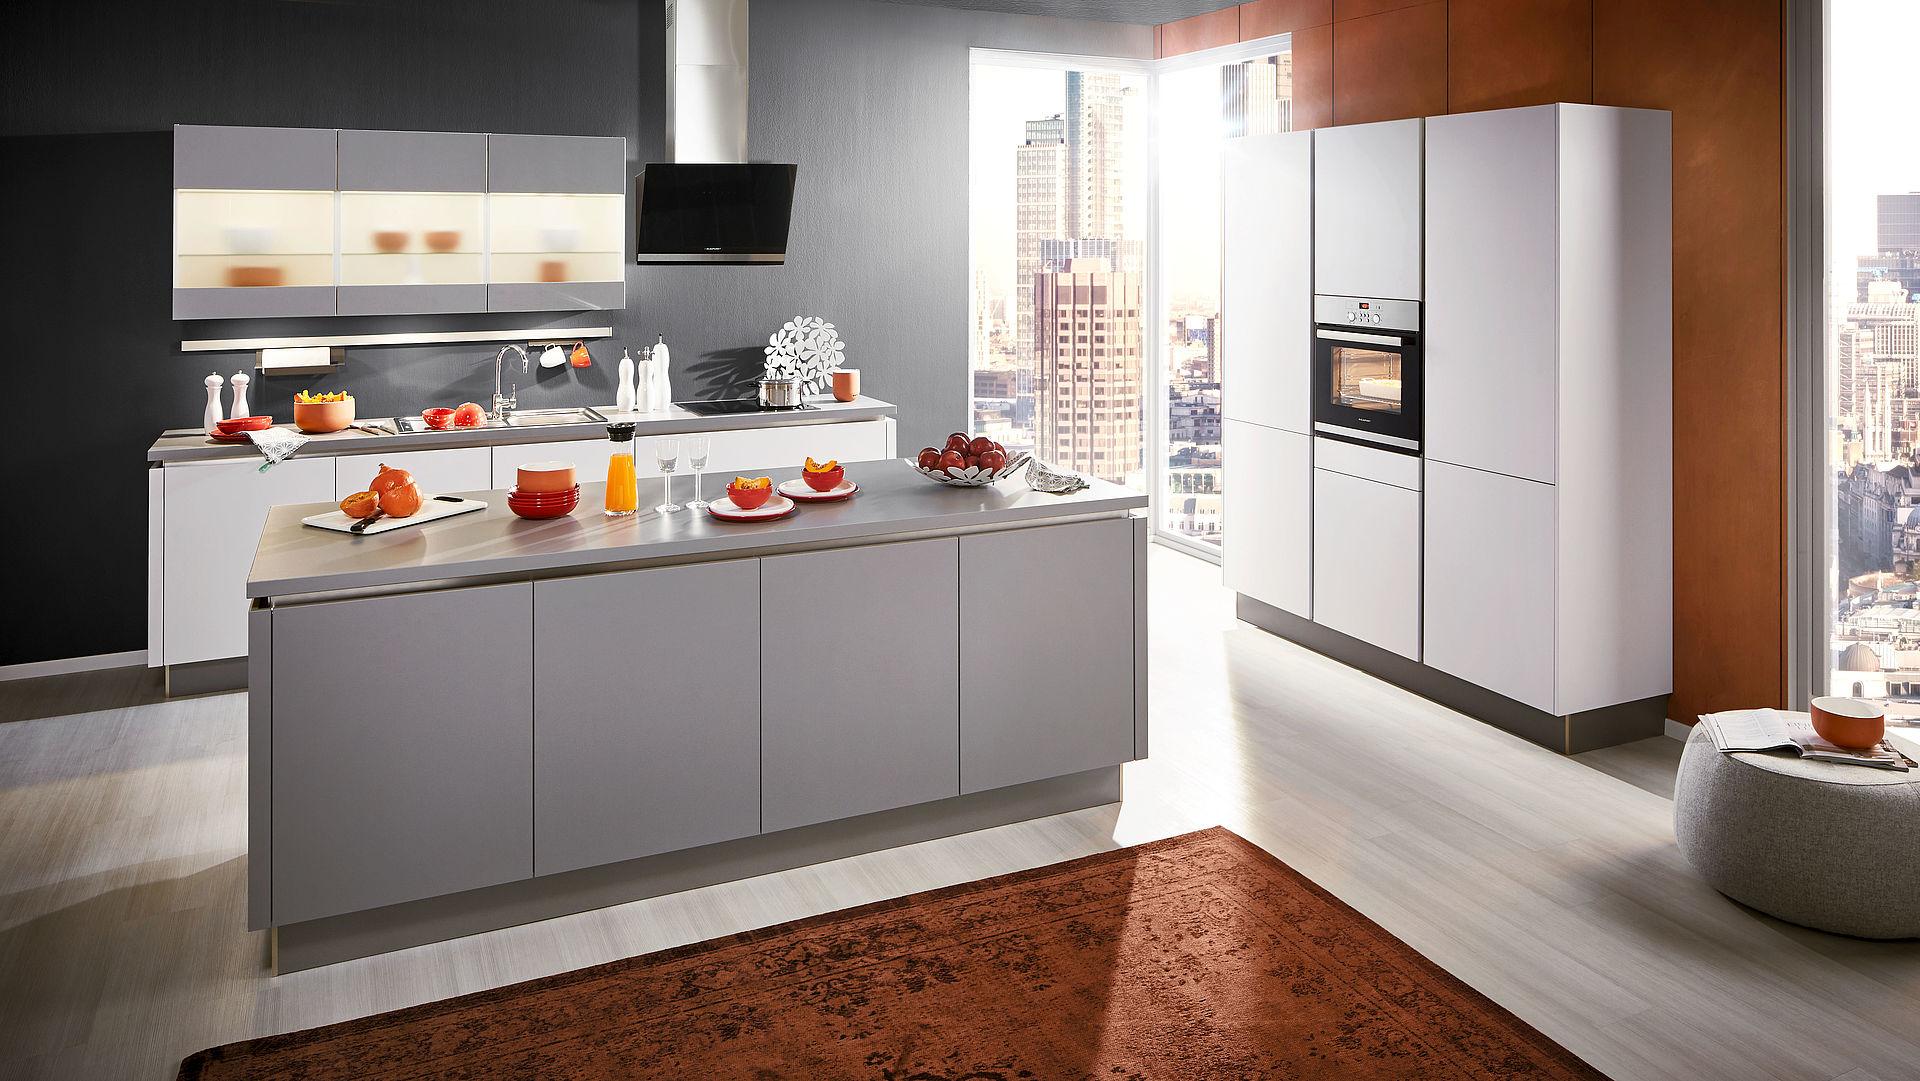 Full Size of Küche Mit Insel Ikea Nobilia Küche Mit Insel Grifflose Küche Mit Insel Küche Mit Insel Ohne Geräte Küche Küche Mit Insel